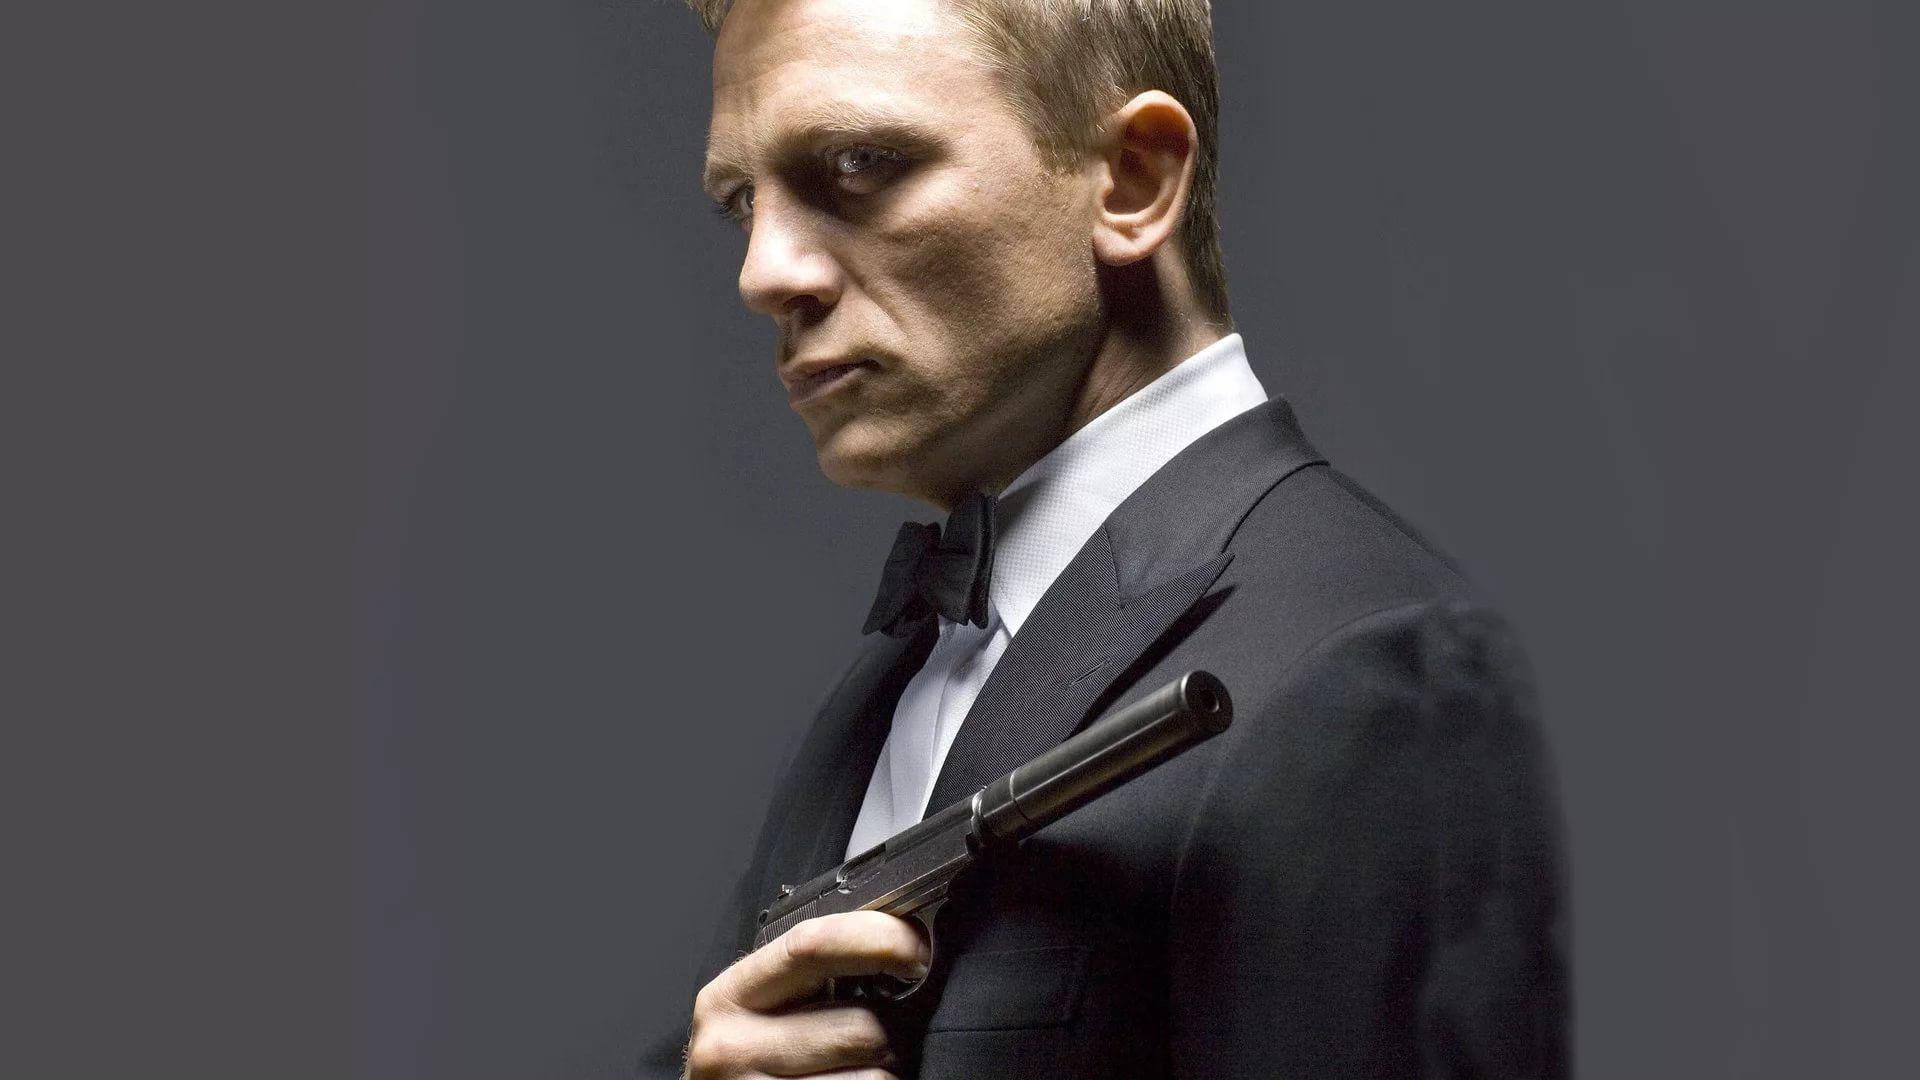 James Bond HD 1080 wallpaper